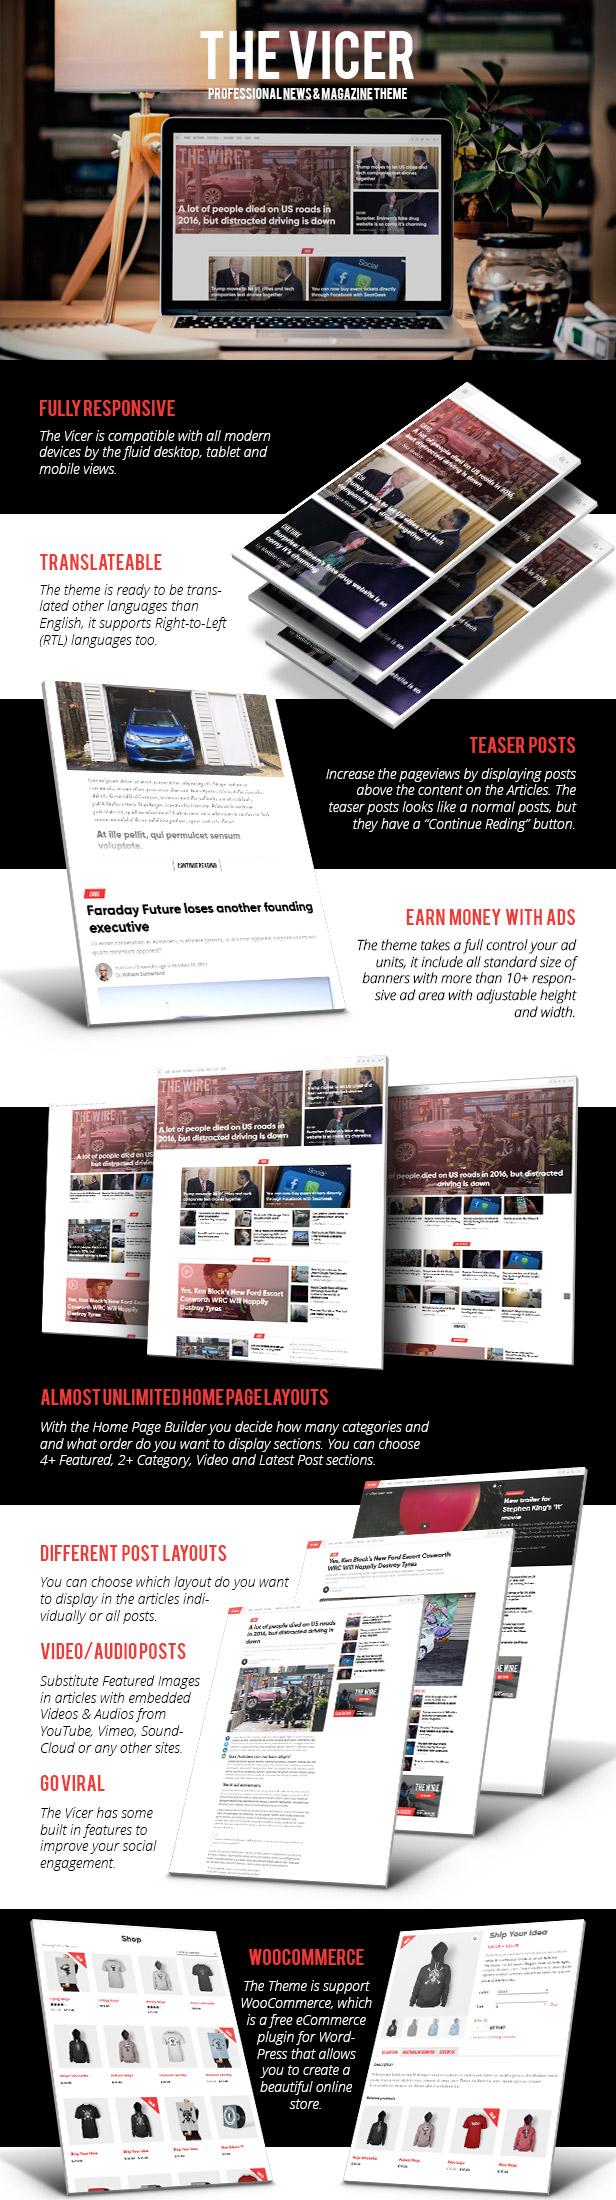 the vicer - professional news & magazine wordpress theme (news / editorial) The Vicer – Professional News & Magazine WordPress Theme (News / Editorial) desc